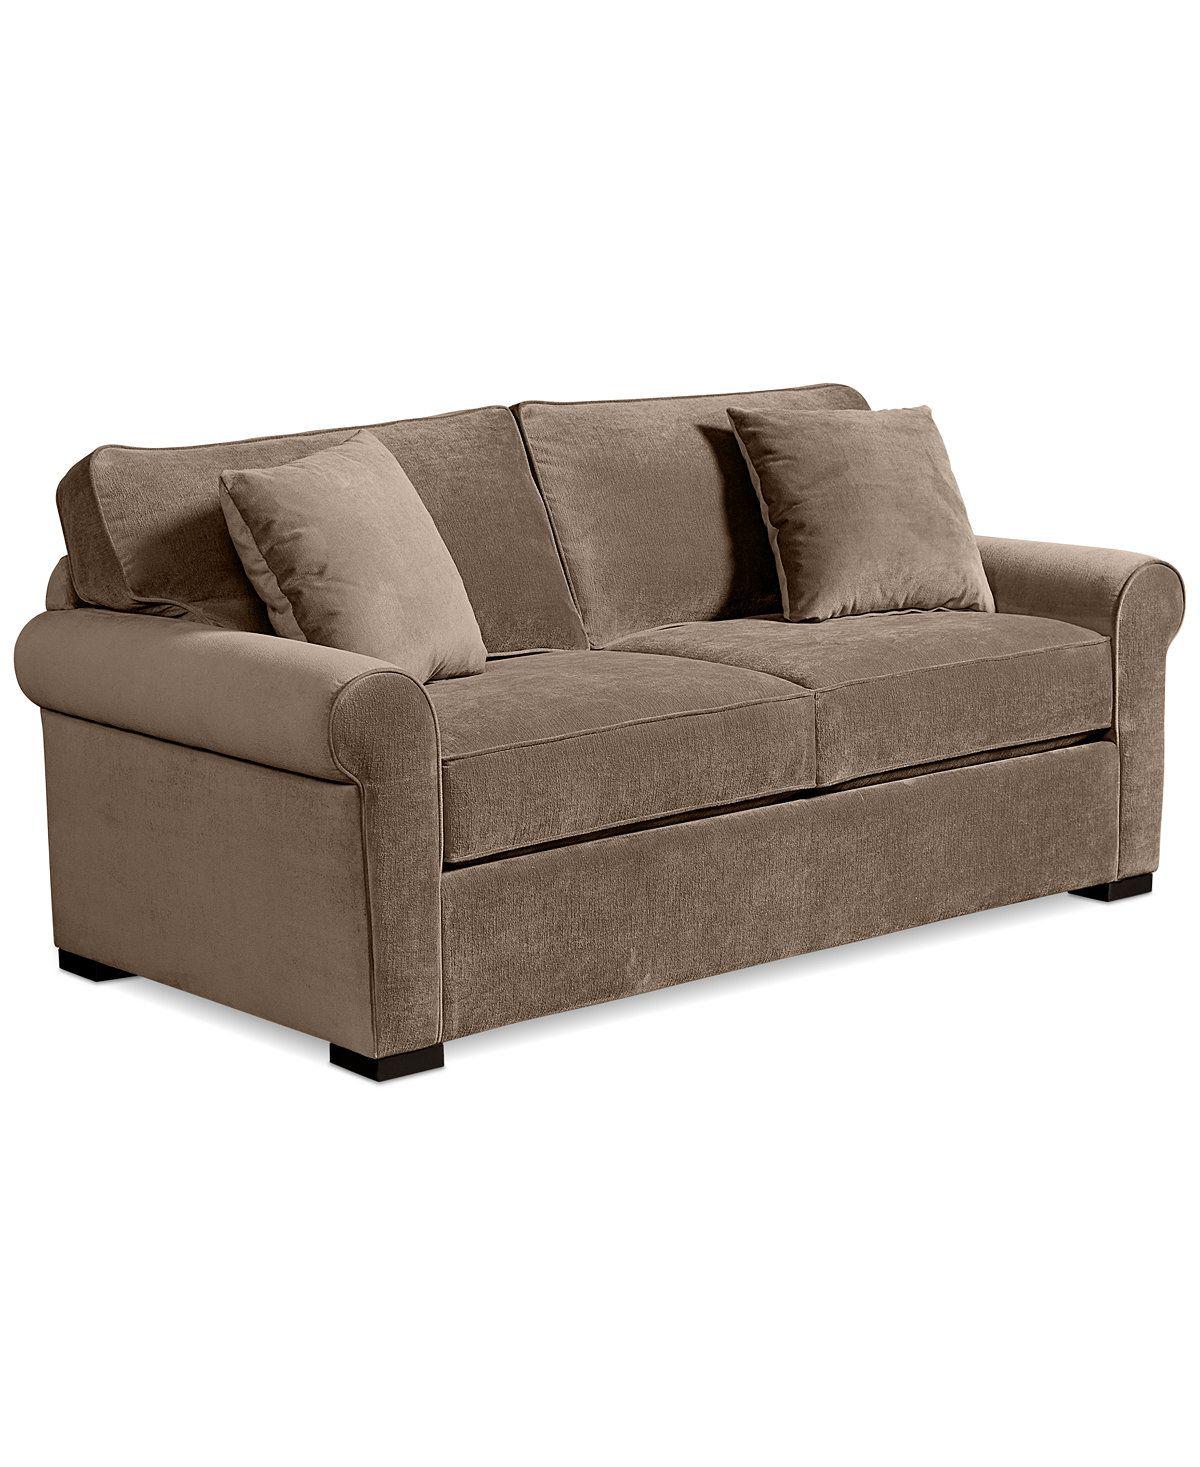 Remo Ii Fabric Full Sleeper Sofa Bed Custom Colors Couches Sofas Furniture Macy S Full Sleeper Sofa Sleeper Sofa Sofa Bed Furniture